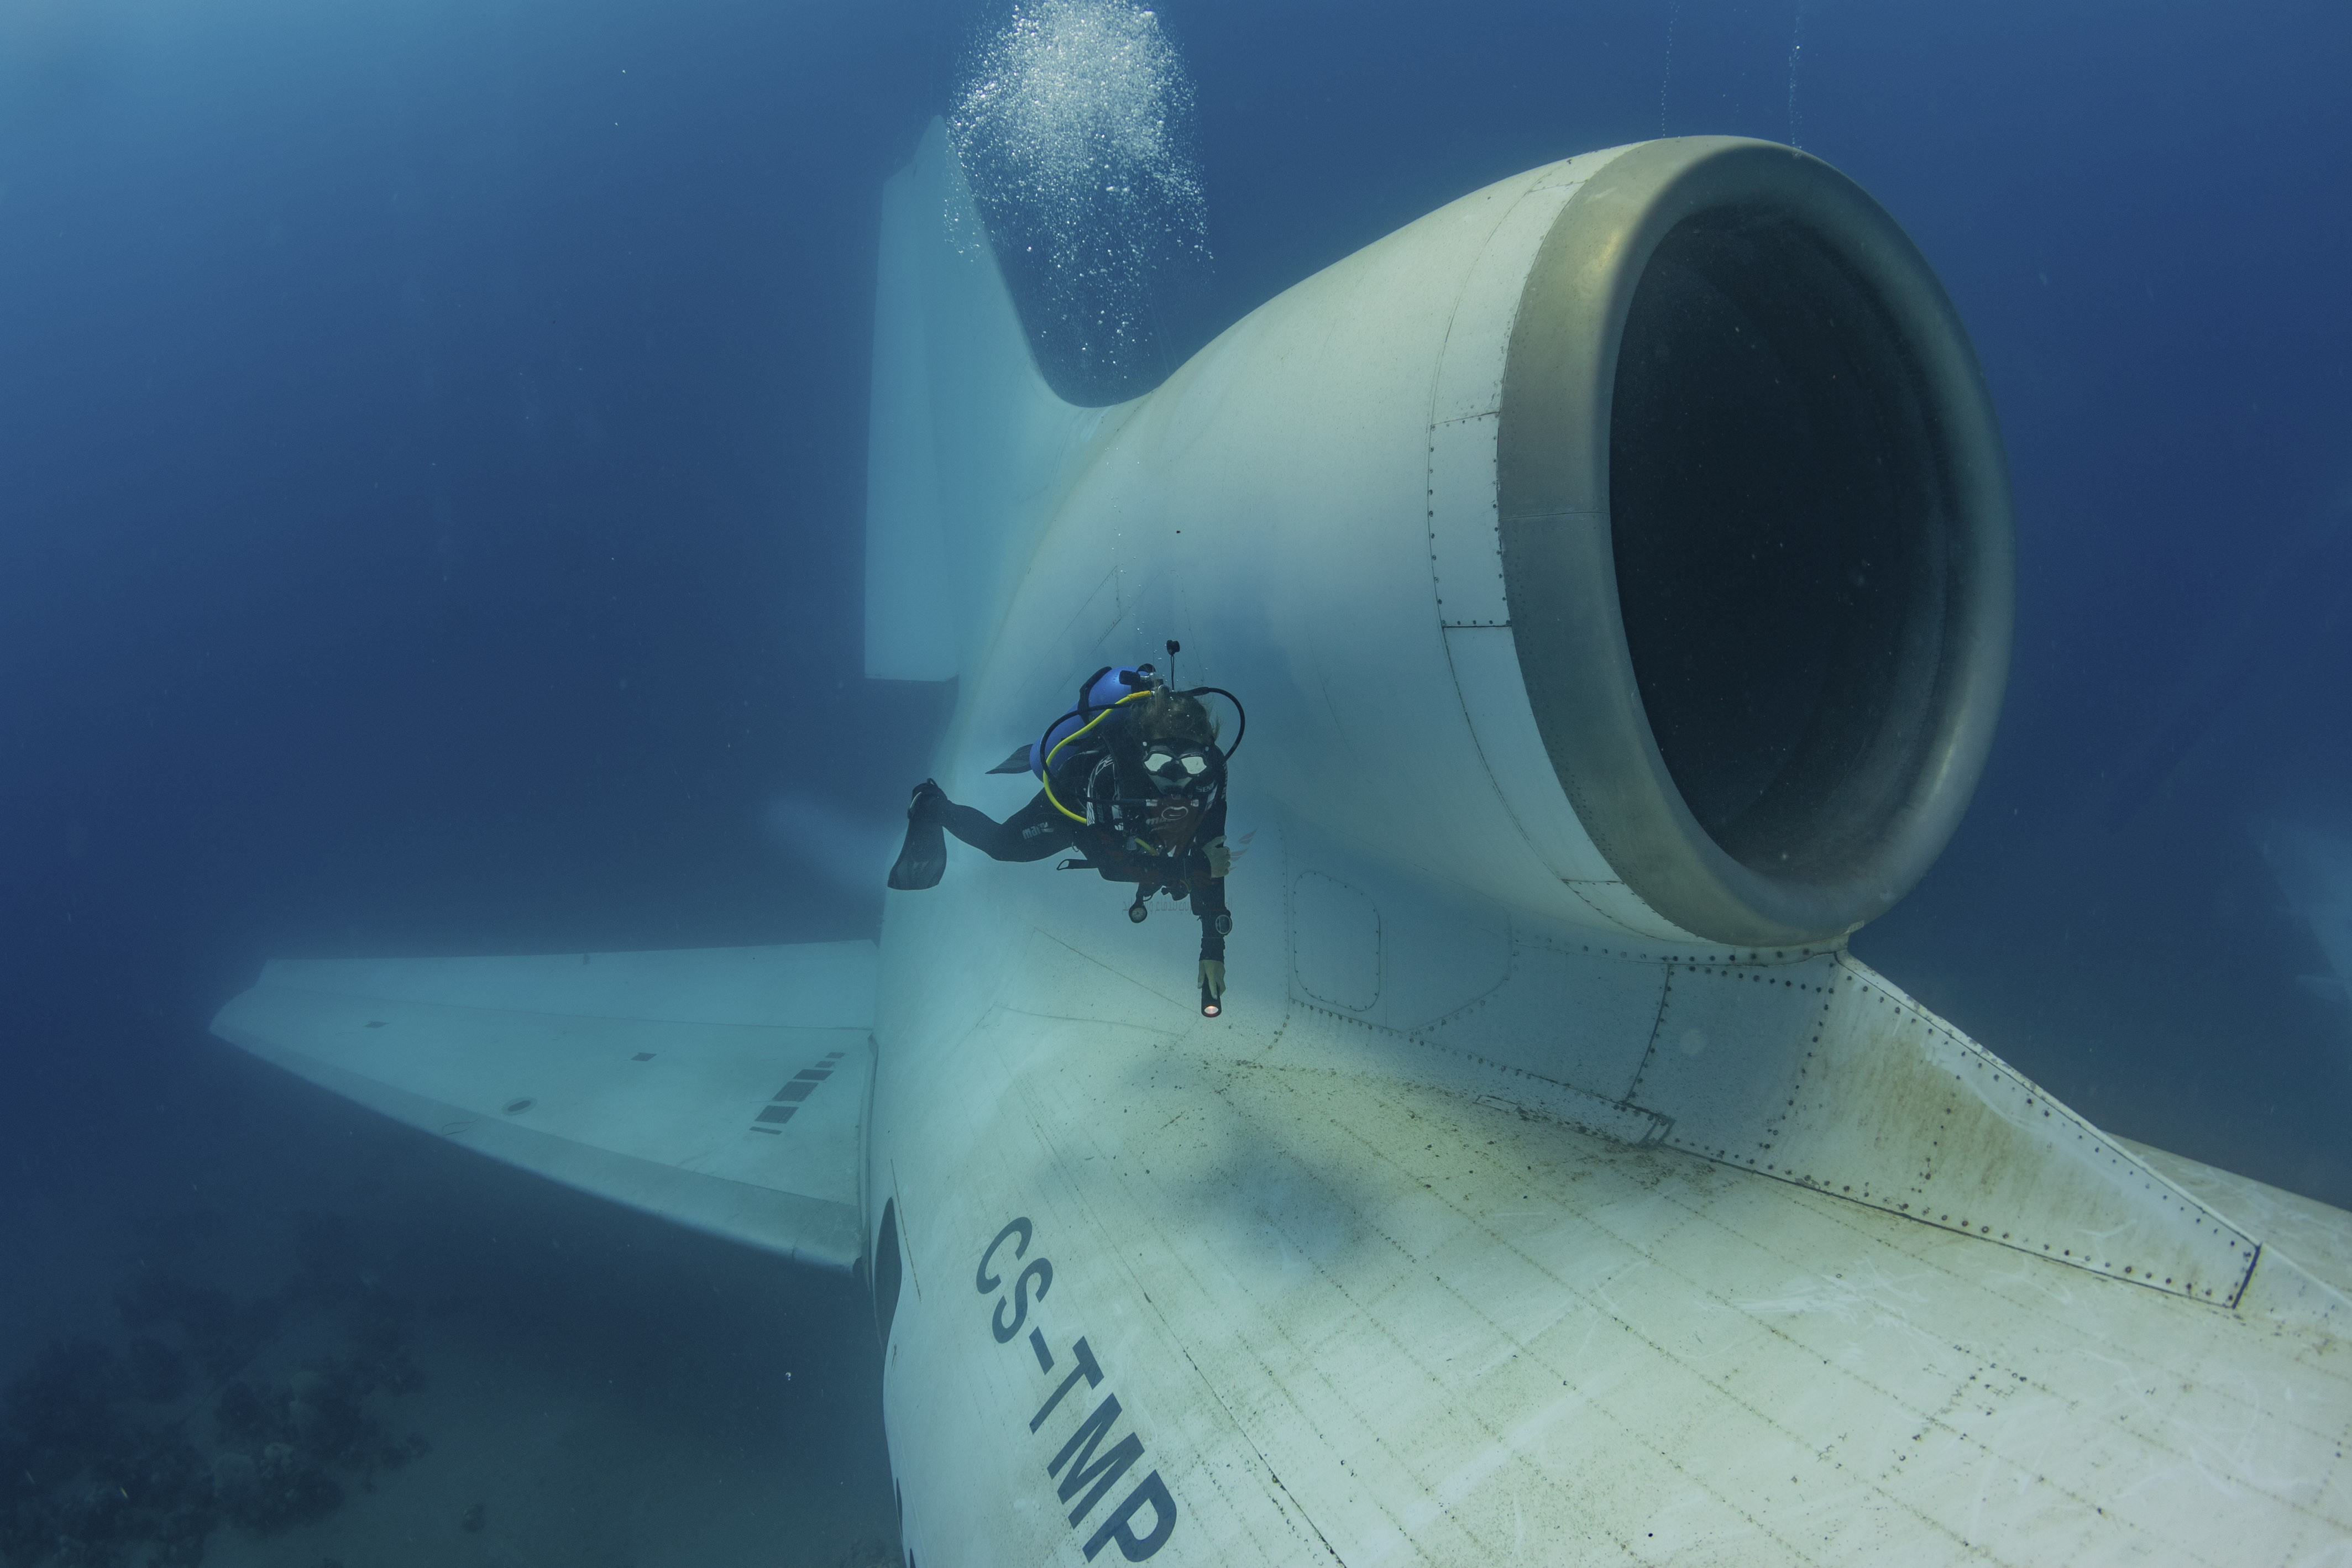 CATERS_Diving_a_sunken_plane_011-1.jpg